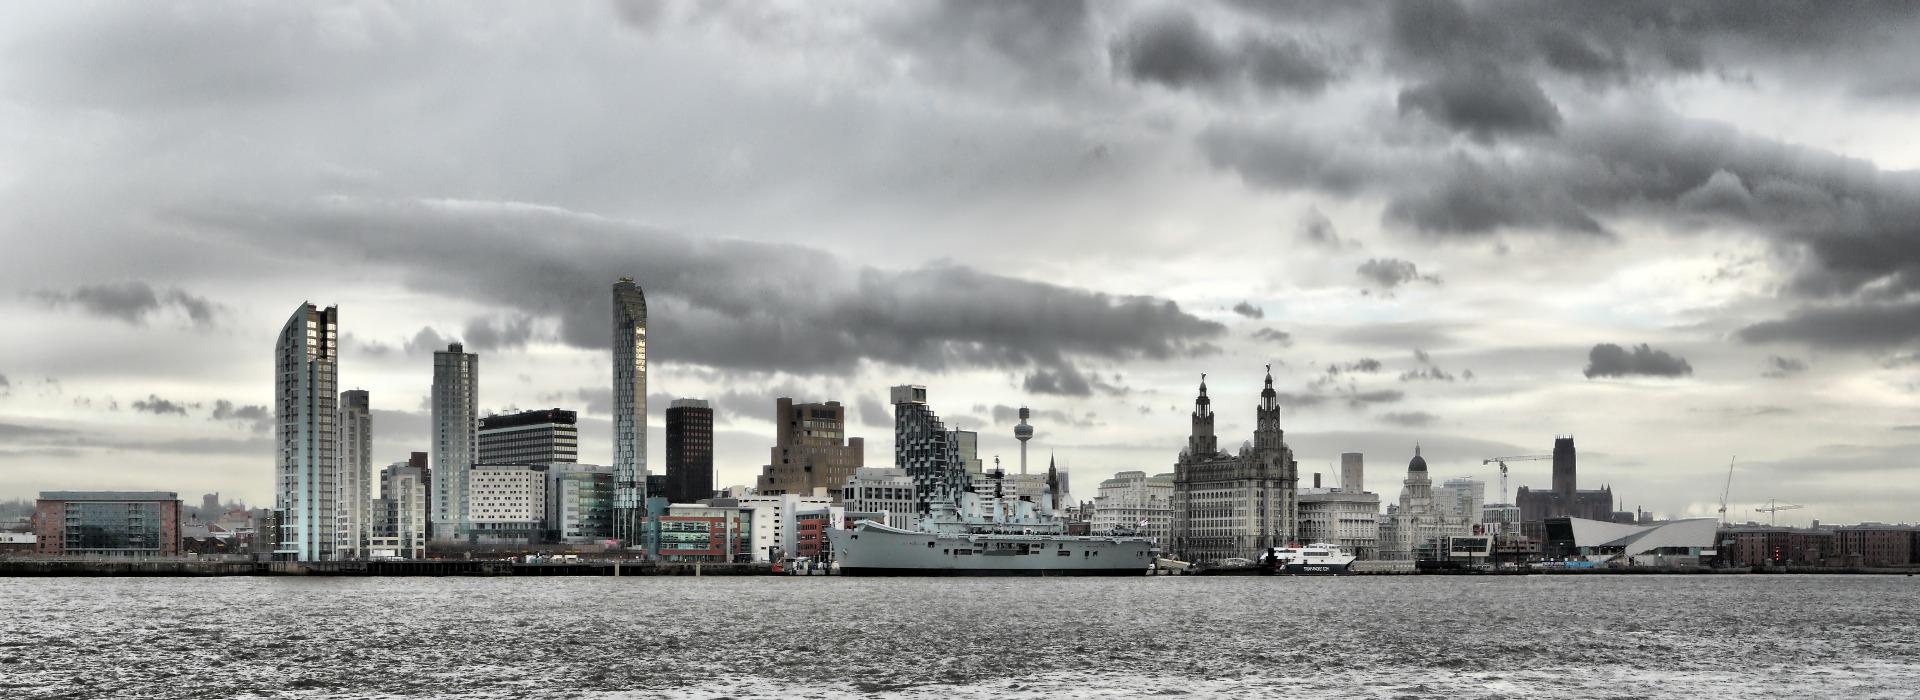 Liverpool_Skyline_with_HMS_Ark_Royal1920